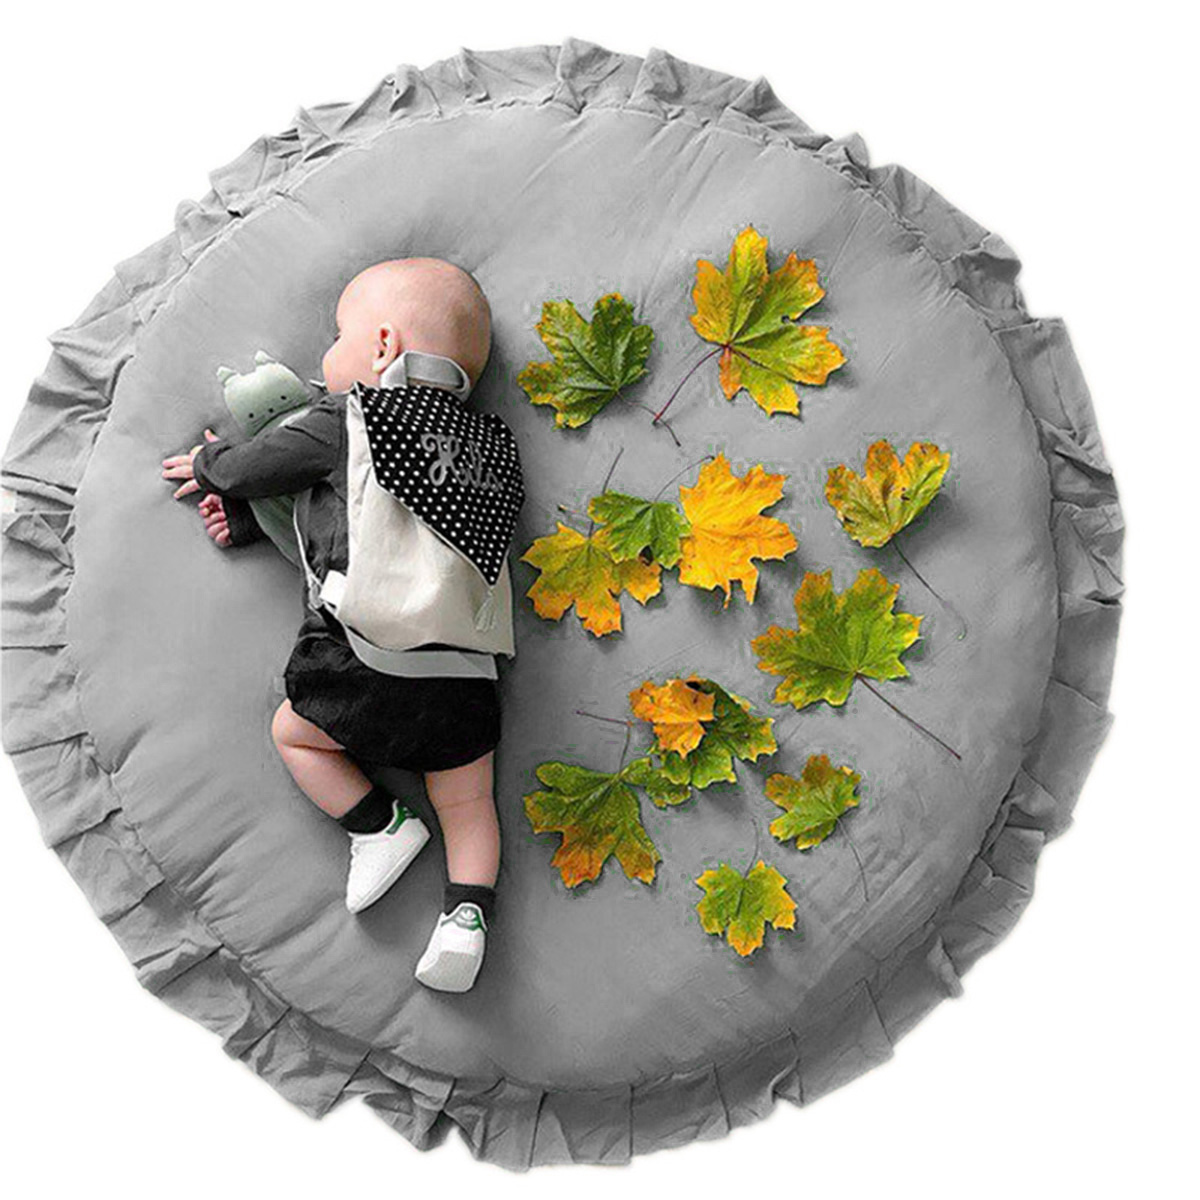 105cm Round Soft Baby Play Mats Cotton Padded Crawling Mats